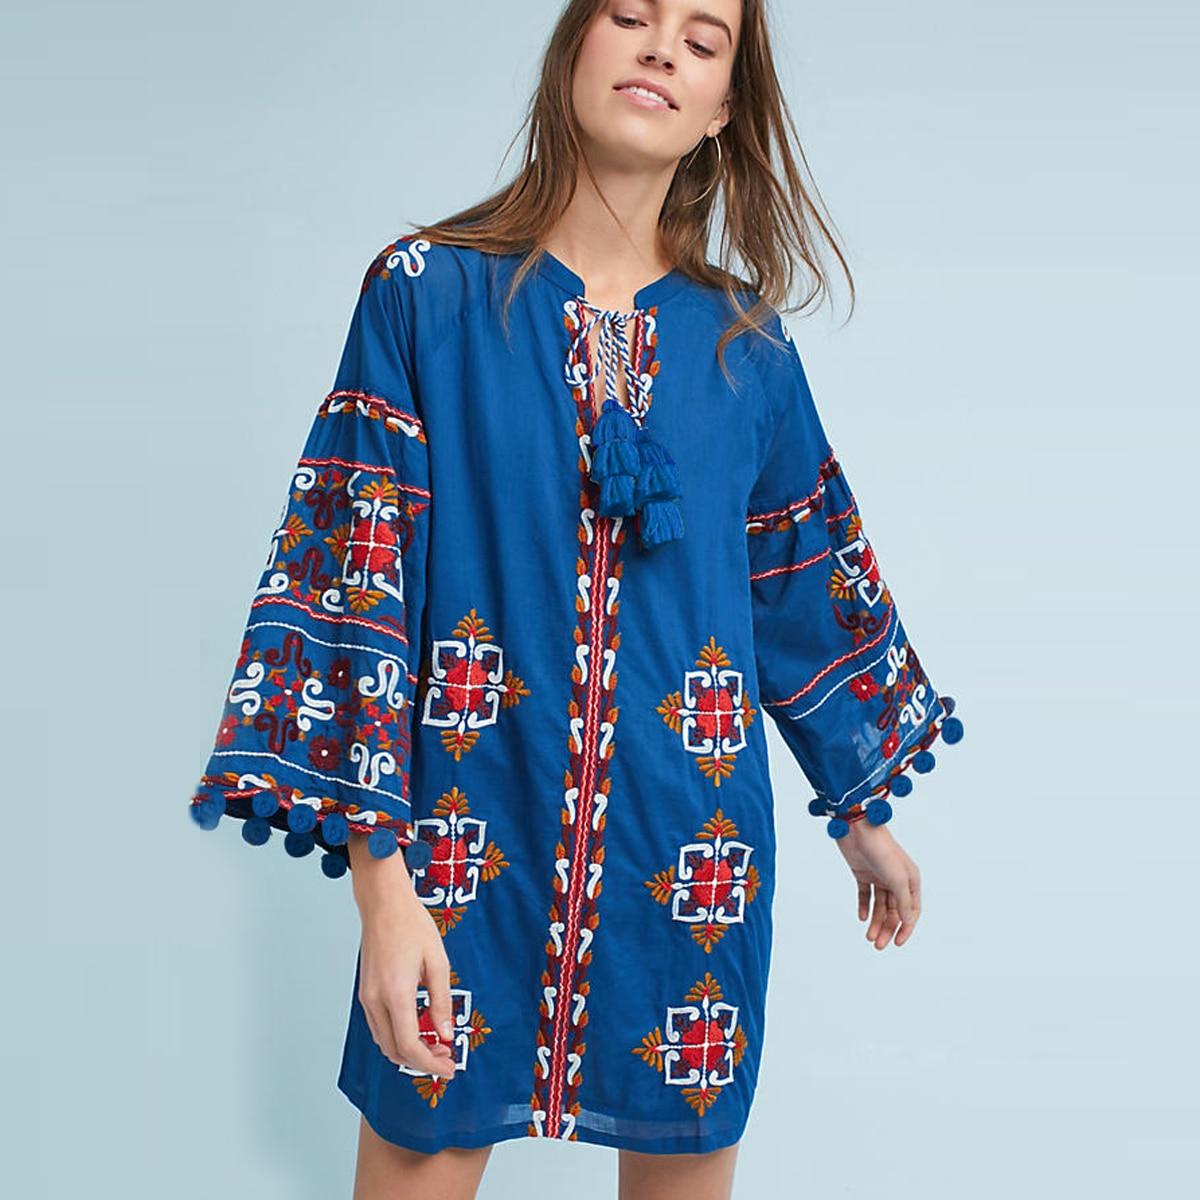 Jastie Palma Embroidered Tunic Dress V Neck Casual Boho Chic Mini Dresses Long Sleeve Spring Women Dress Pullover styling Dresse